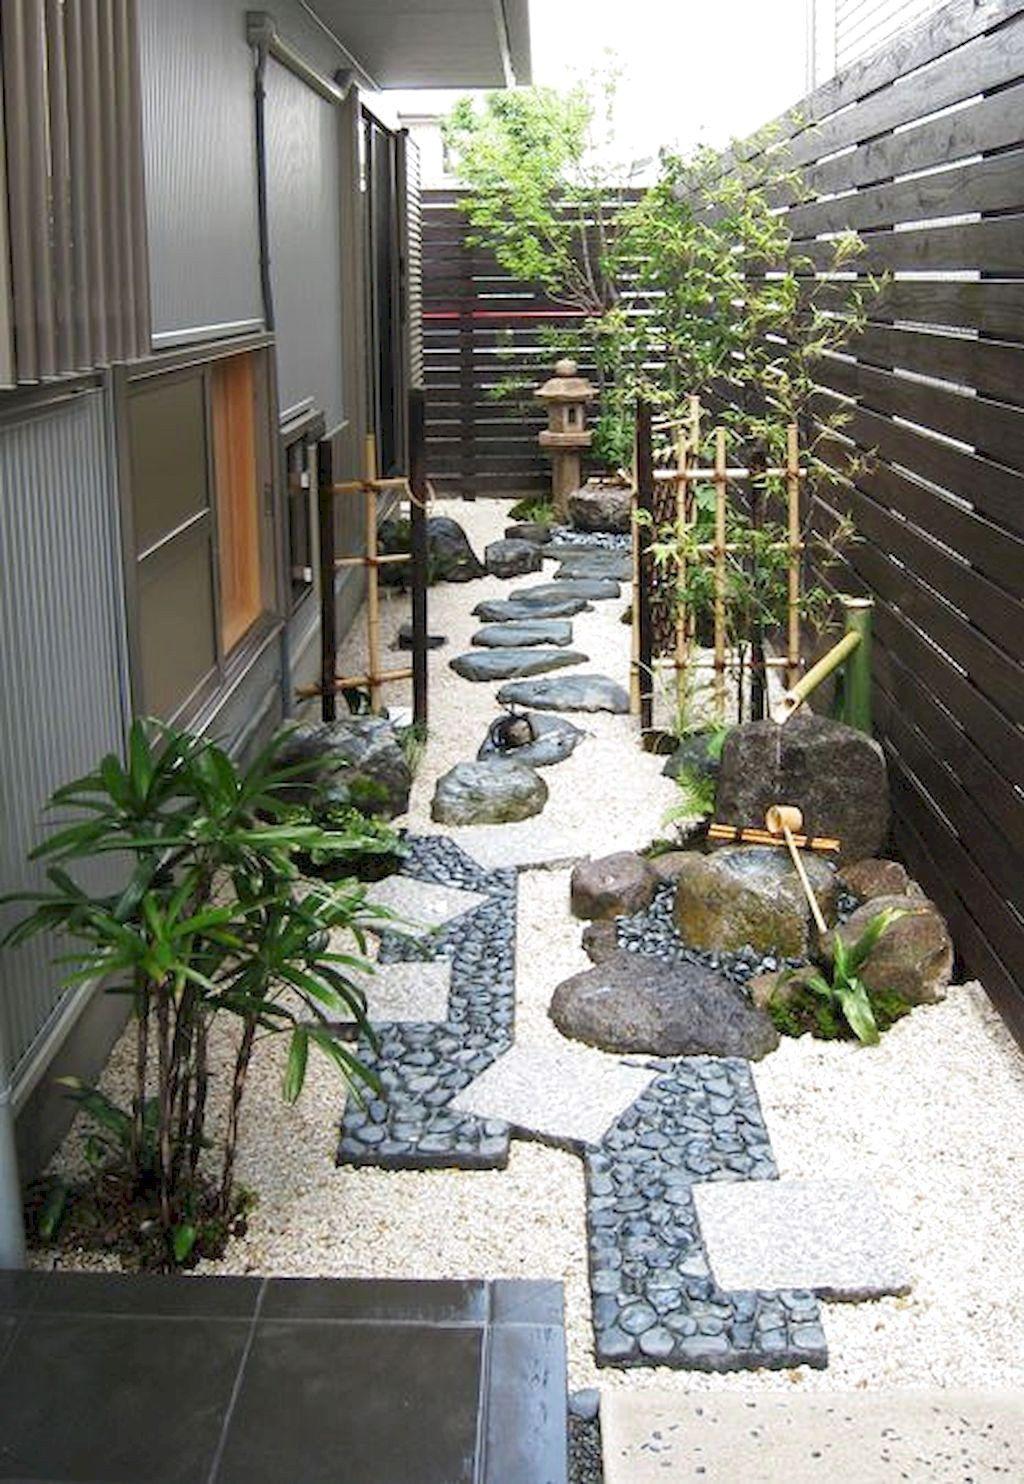 80 Favourite Side House Garden Landscaping Decoration Ideas With Rocks In 2020 Japanese Garden Design Zen Garden Design Japanese Garden